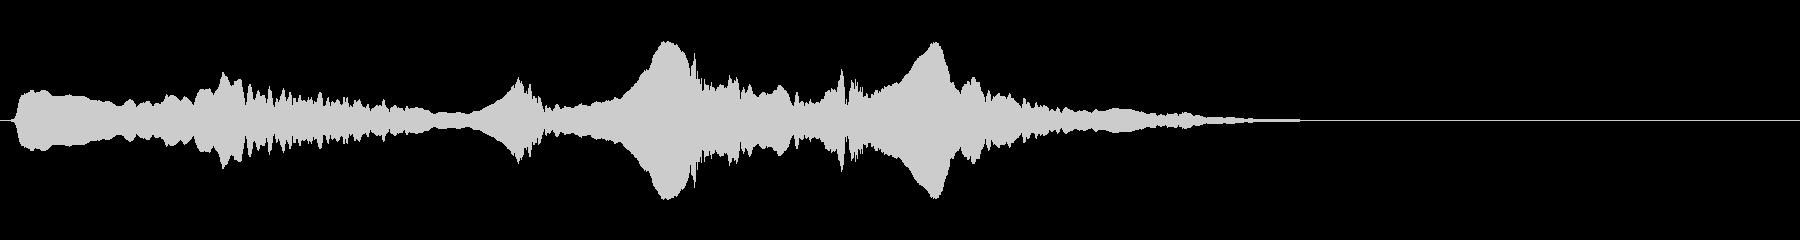 尺八 生演奏 古典風#6の未再生の波形